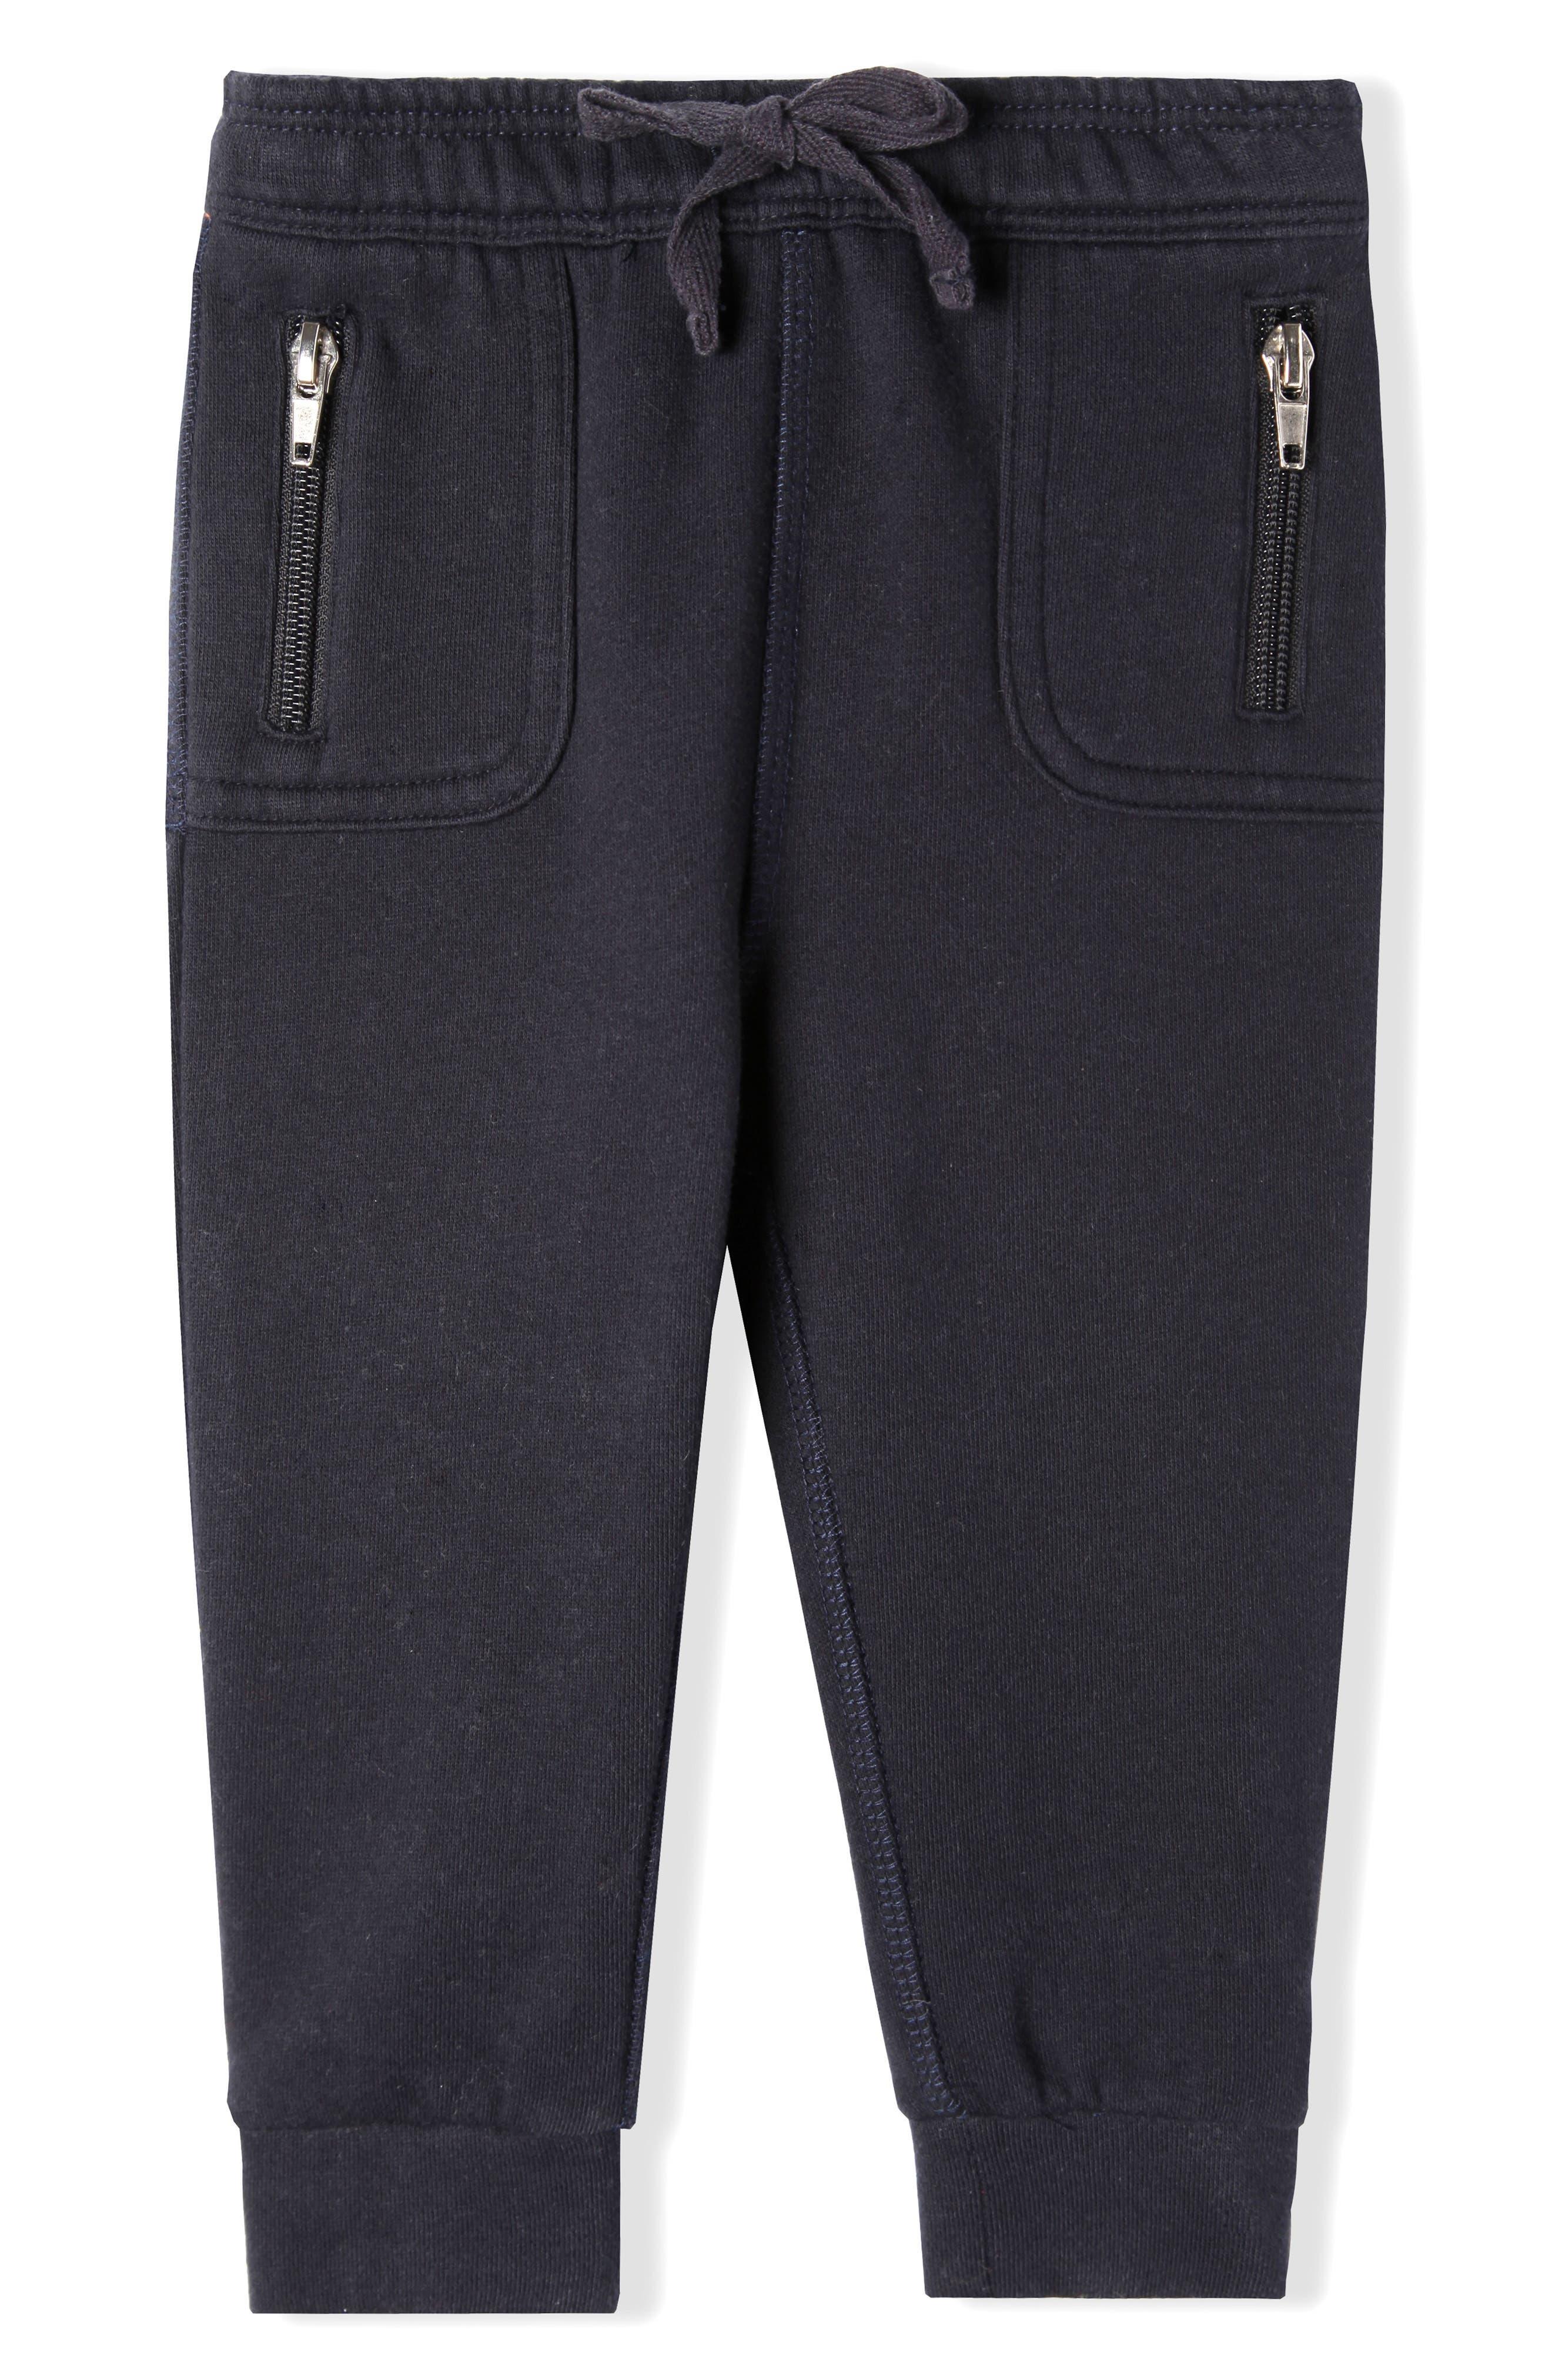 Mercer Organic Cotton Jogger Pants,                             Main thumbnail 1, color,                             True Navy